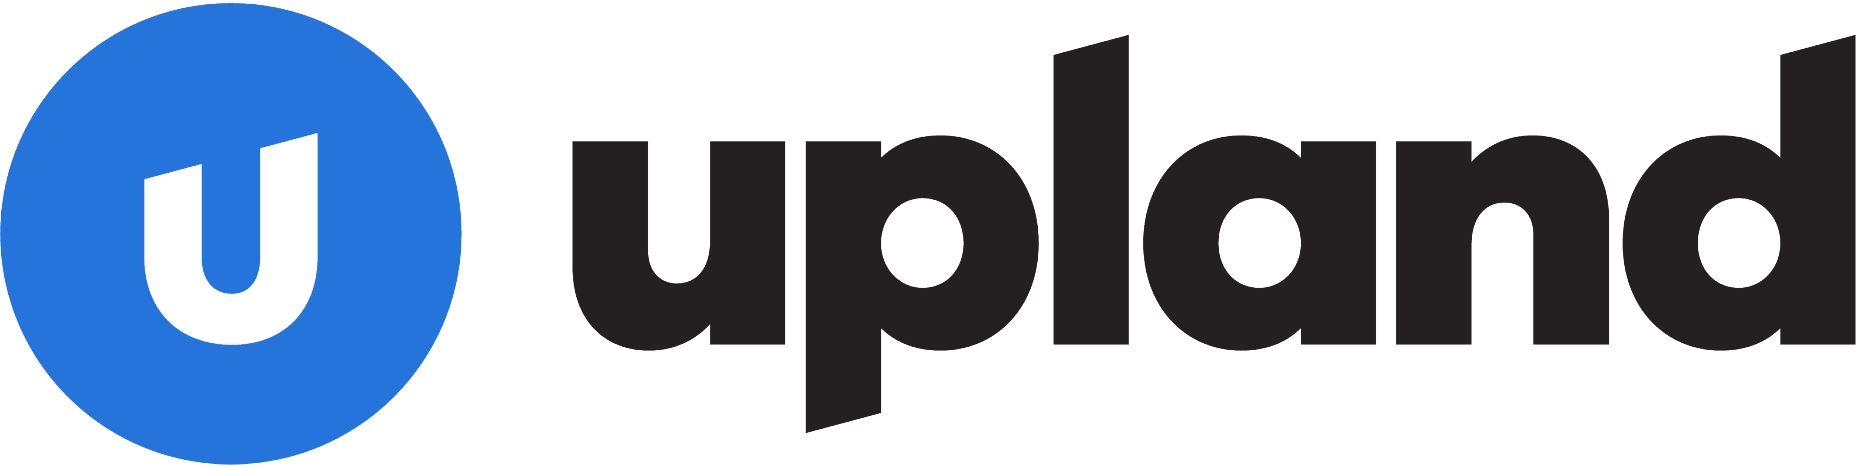 UPLD-20201231_G1.JPG